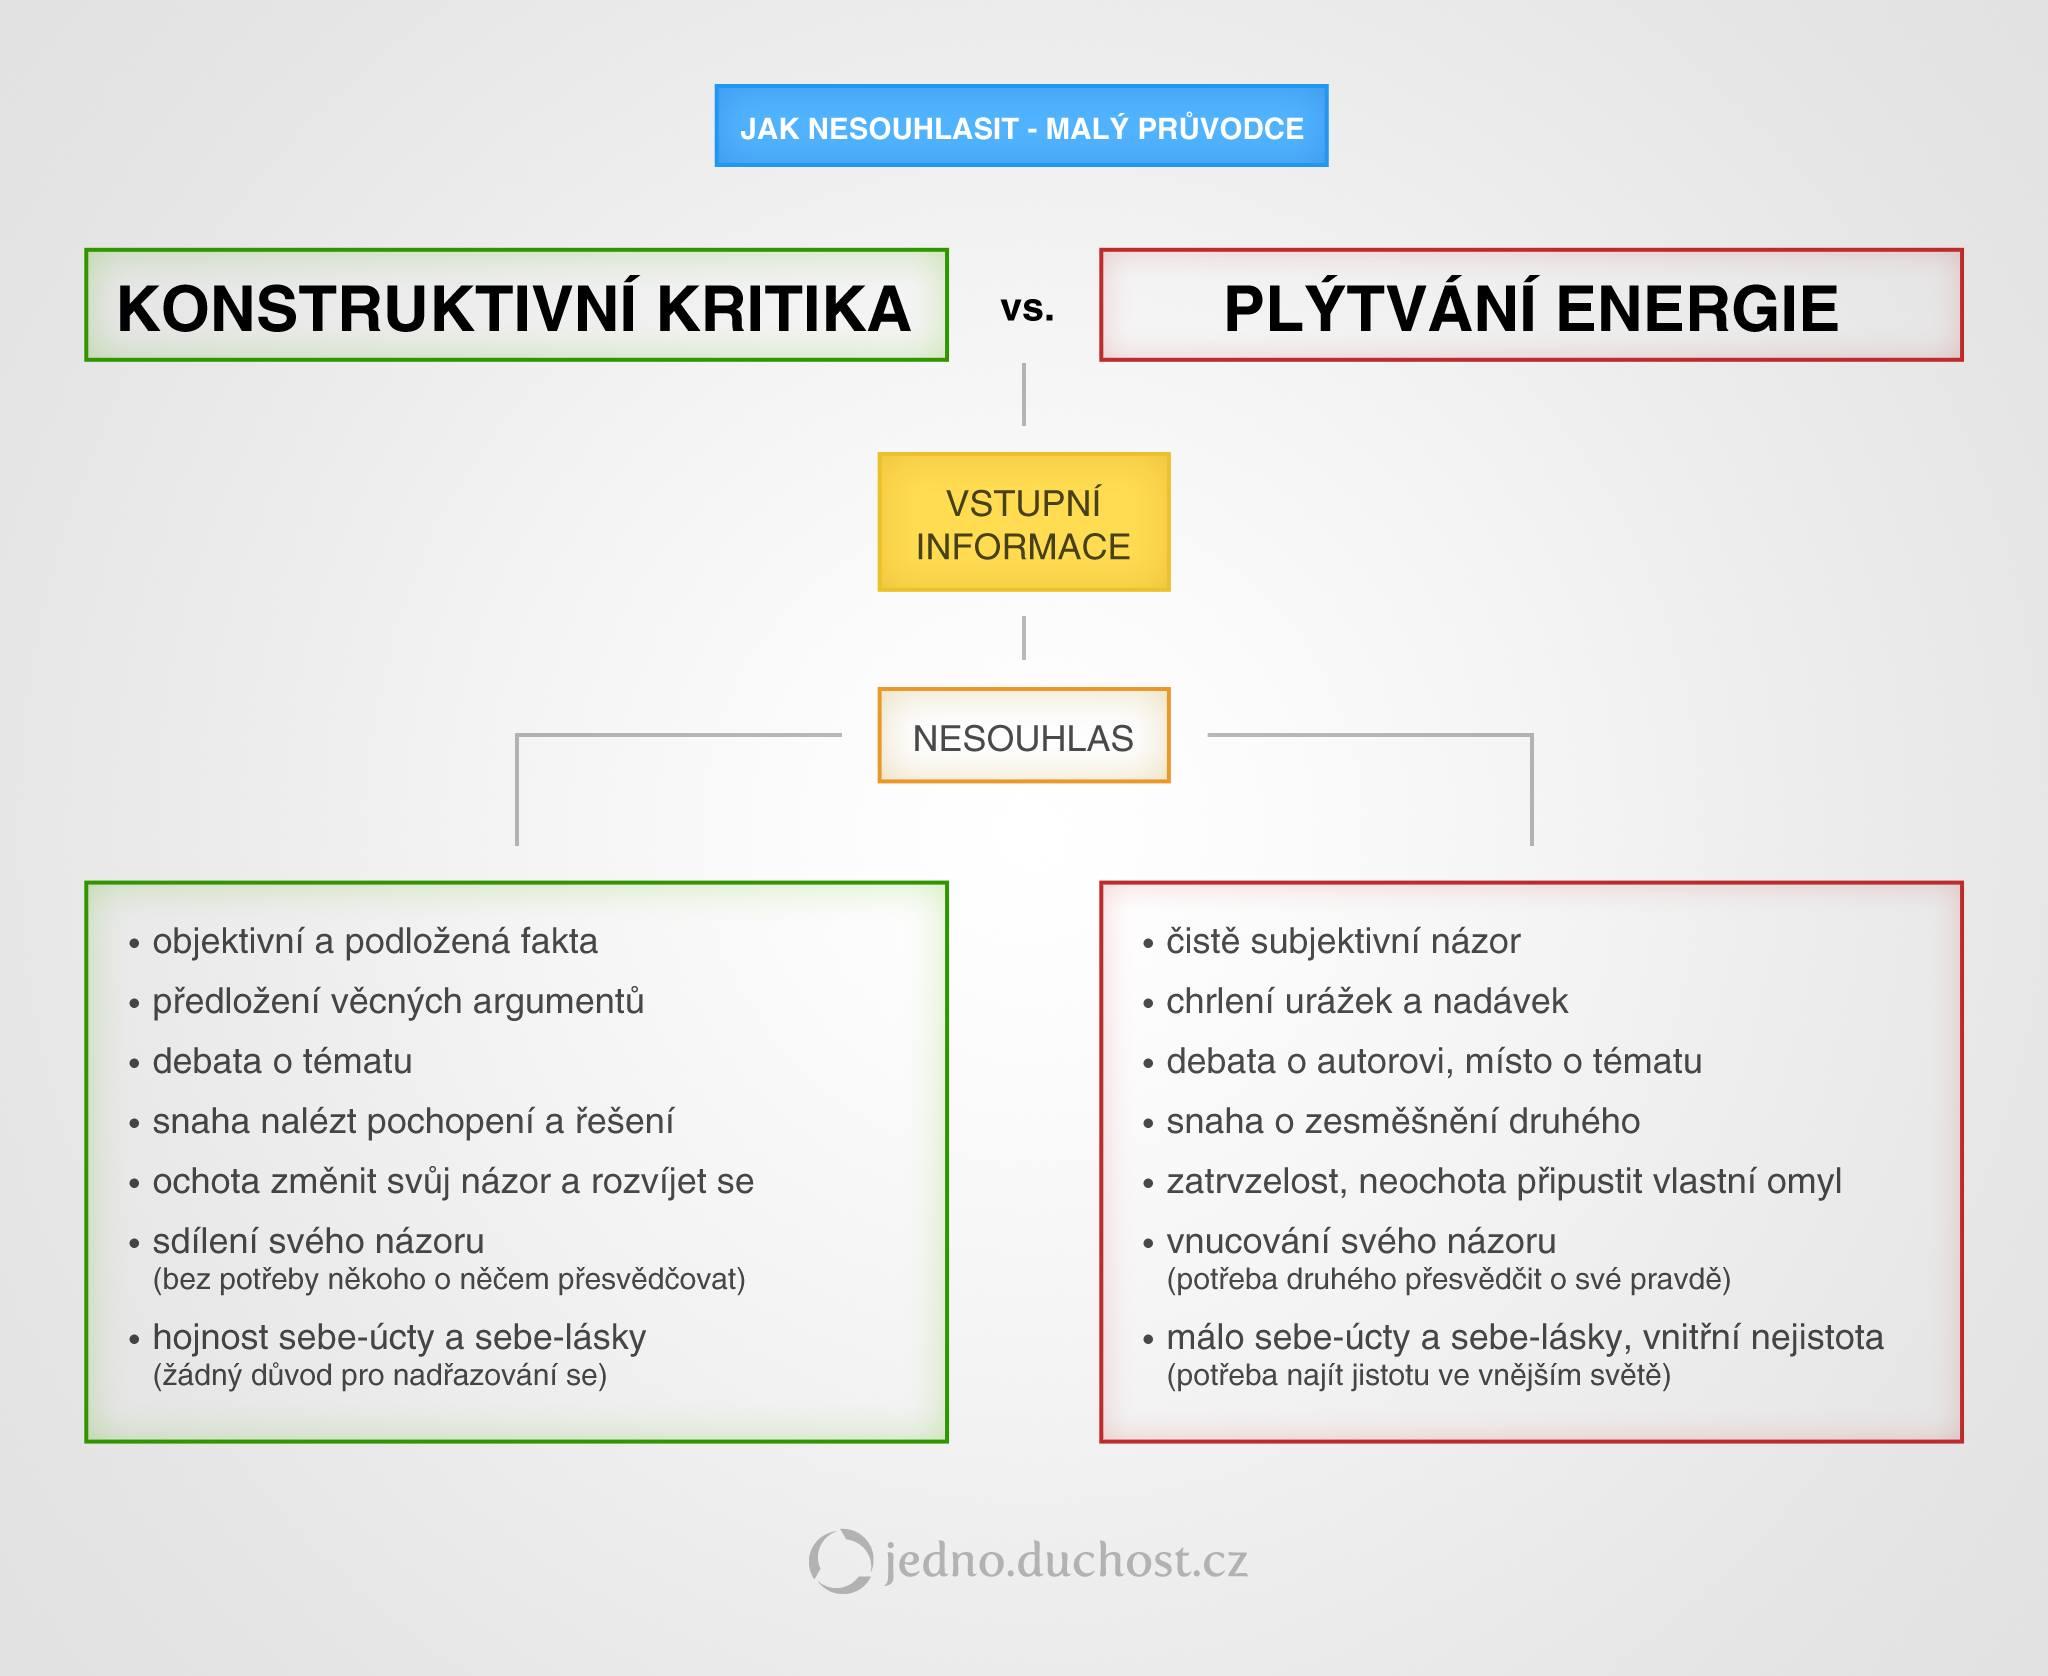 jak-nesouhlasit-konstruktivni-kritika-plytvani-energie-argumenty-hadky-vnucovani-nazoru-jedno.duchost.cz